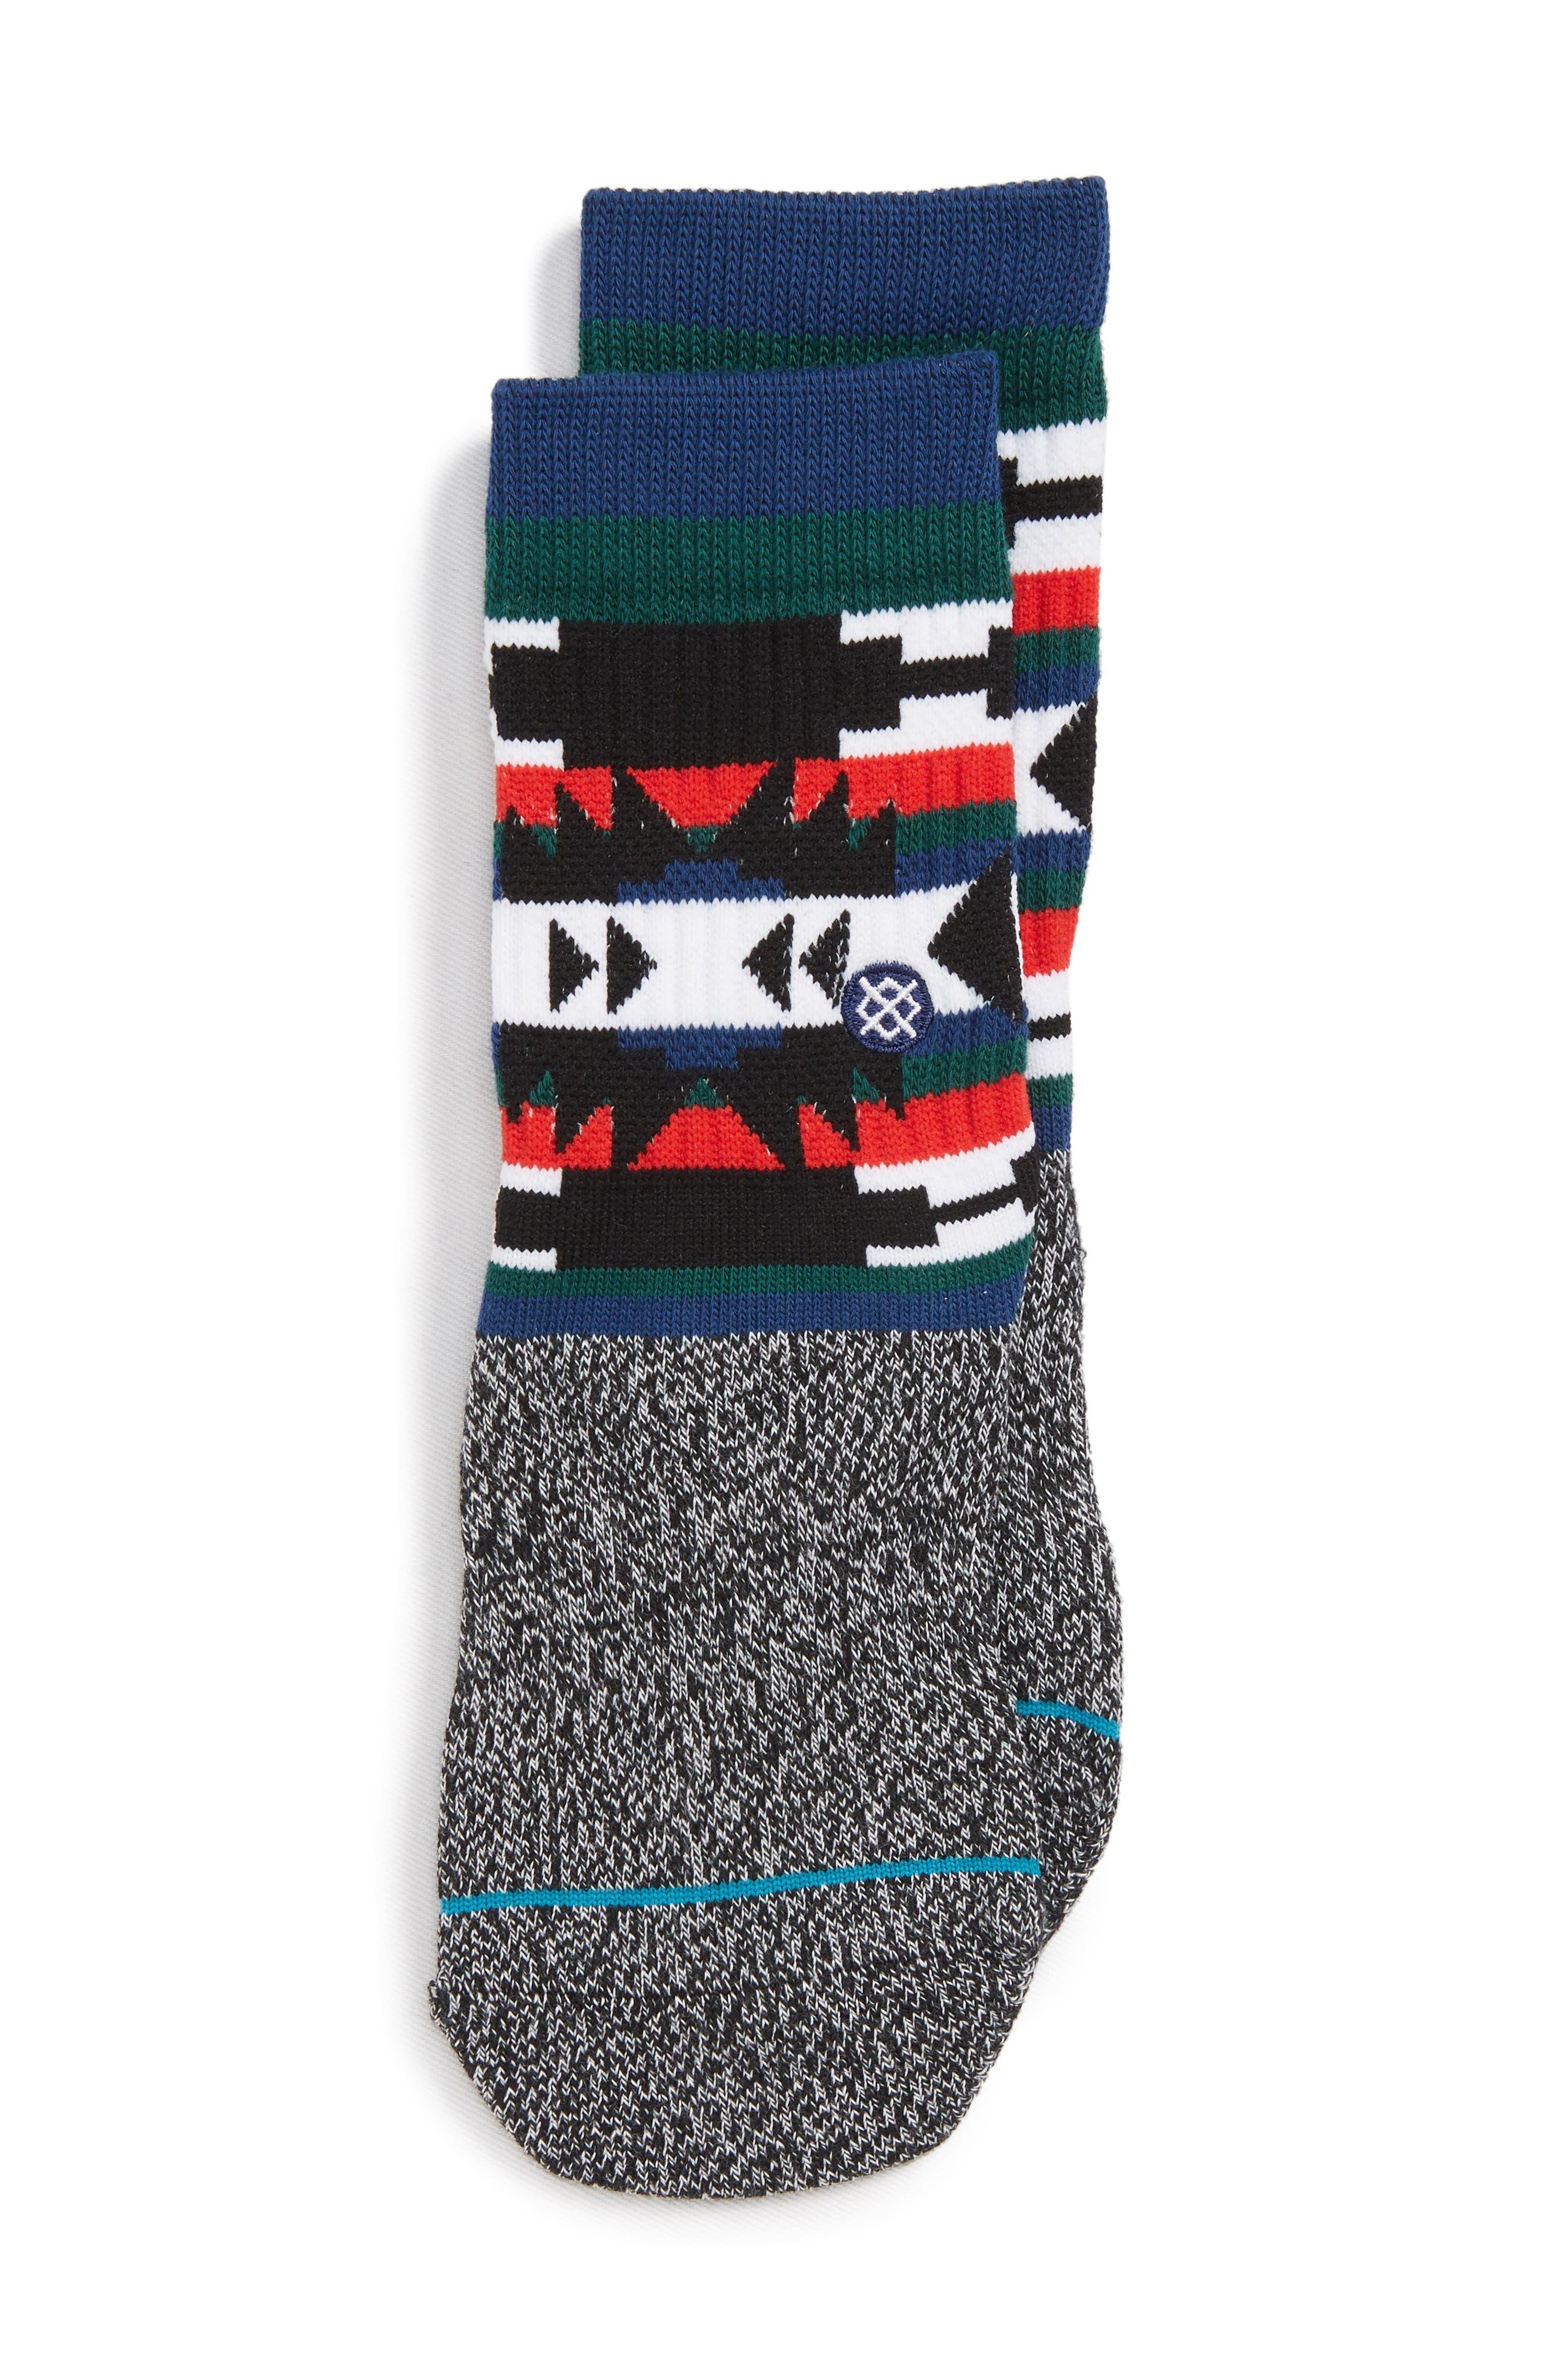 Seapunk Geo Pattern Socks,                         Main,                         color, 020